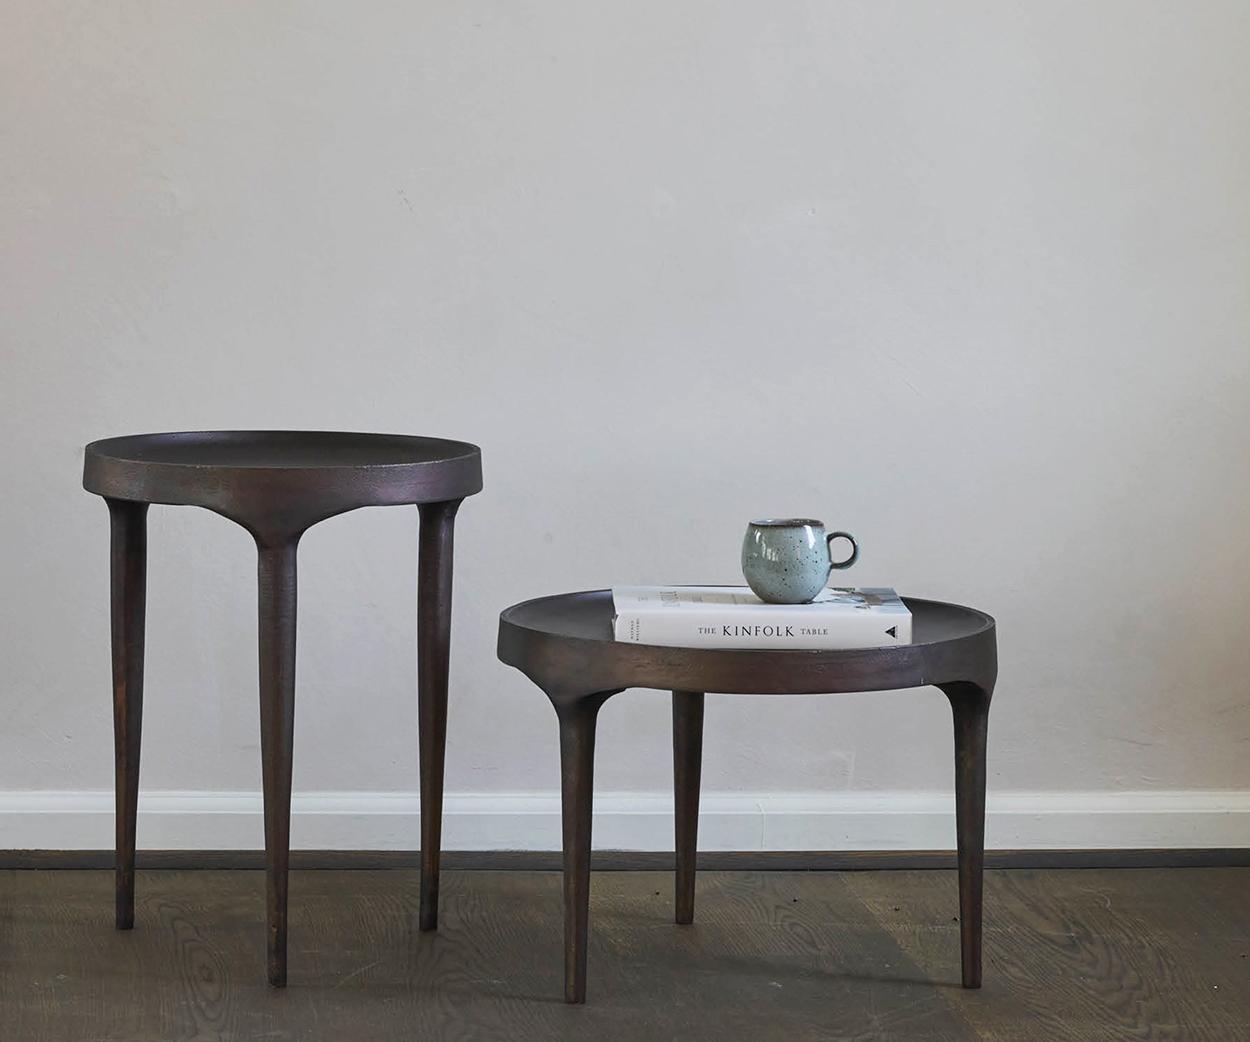 101 Copenhagen Phantom Coffee Table Tall and Short In a Room